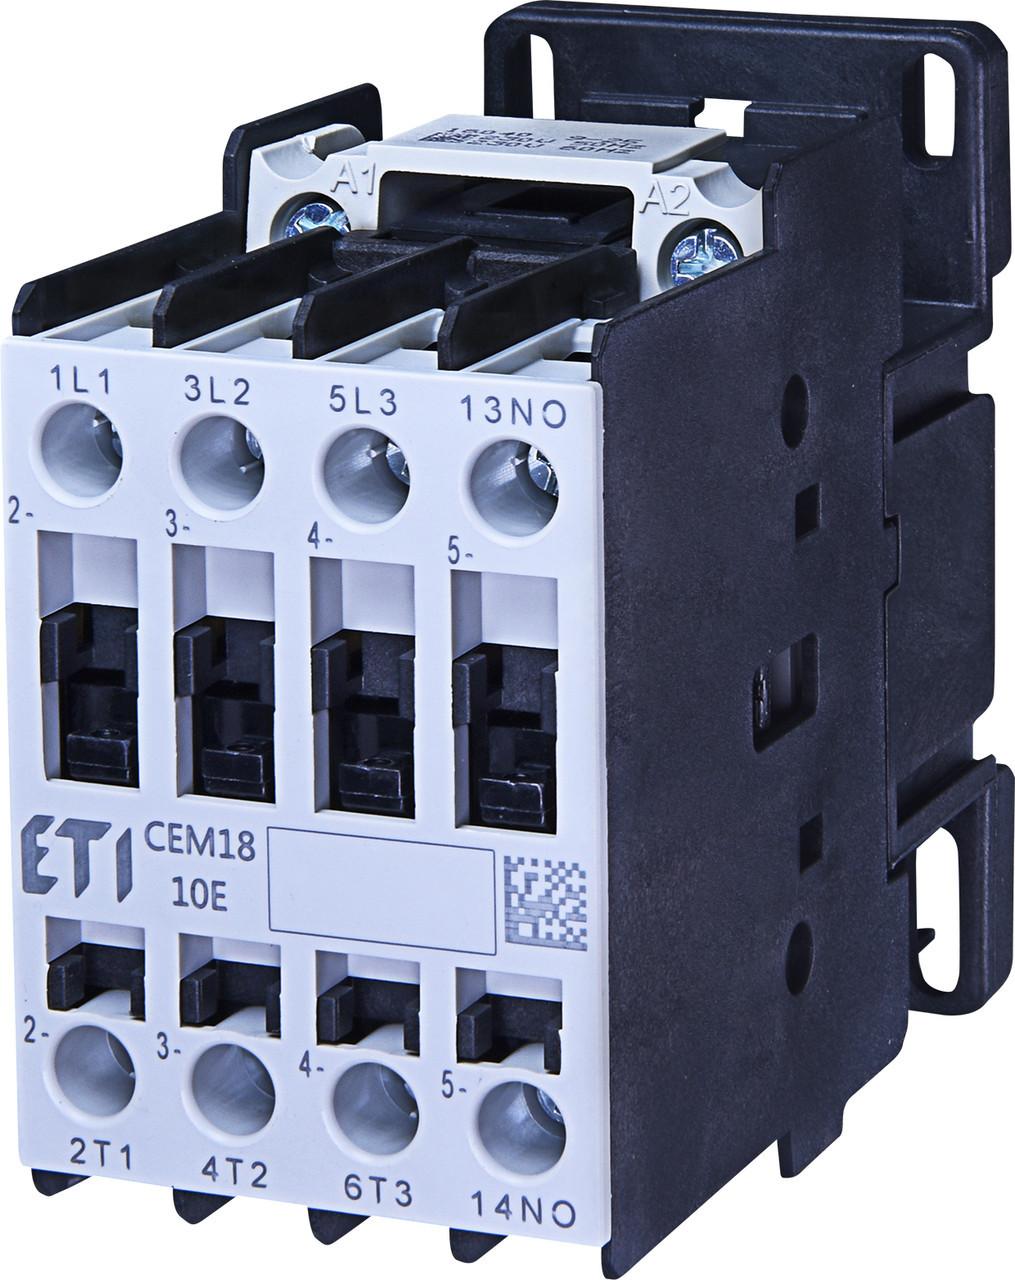 Контактор силовой ETI CEM 18.01 18А 230V AC 3NO+1NC 7.5kW 4644113 (на DIN-рейку, 32A AC1, 18A AC3)